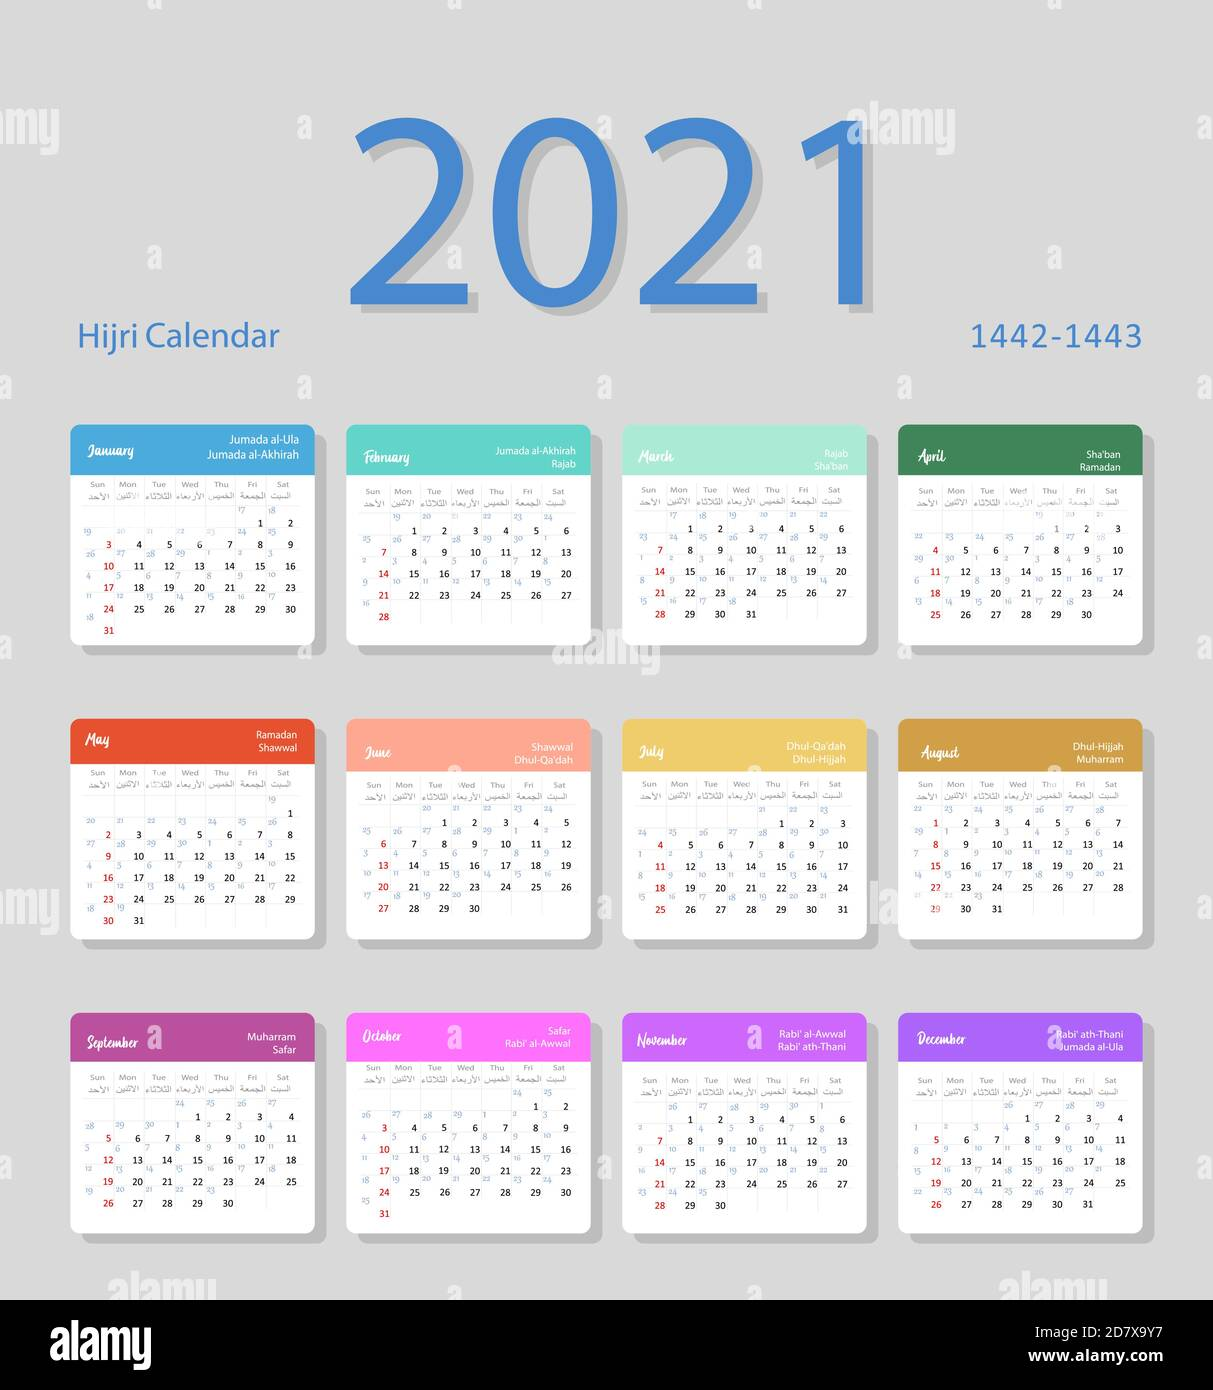 Arabic Calendar 2022.Hijri Islamic Calendar 2021 From 1442 To 1443 Vector Template Stock Vector Image Art Alamy